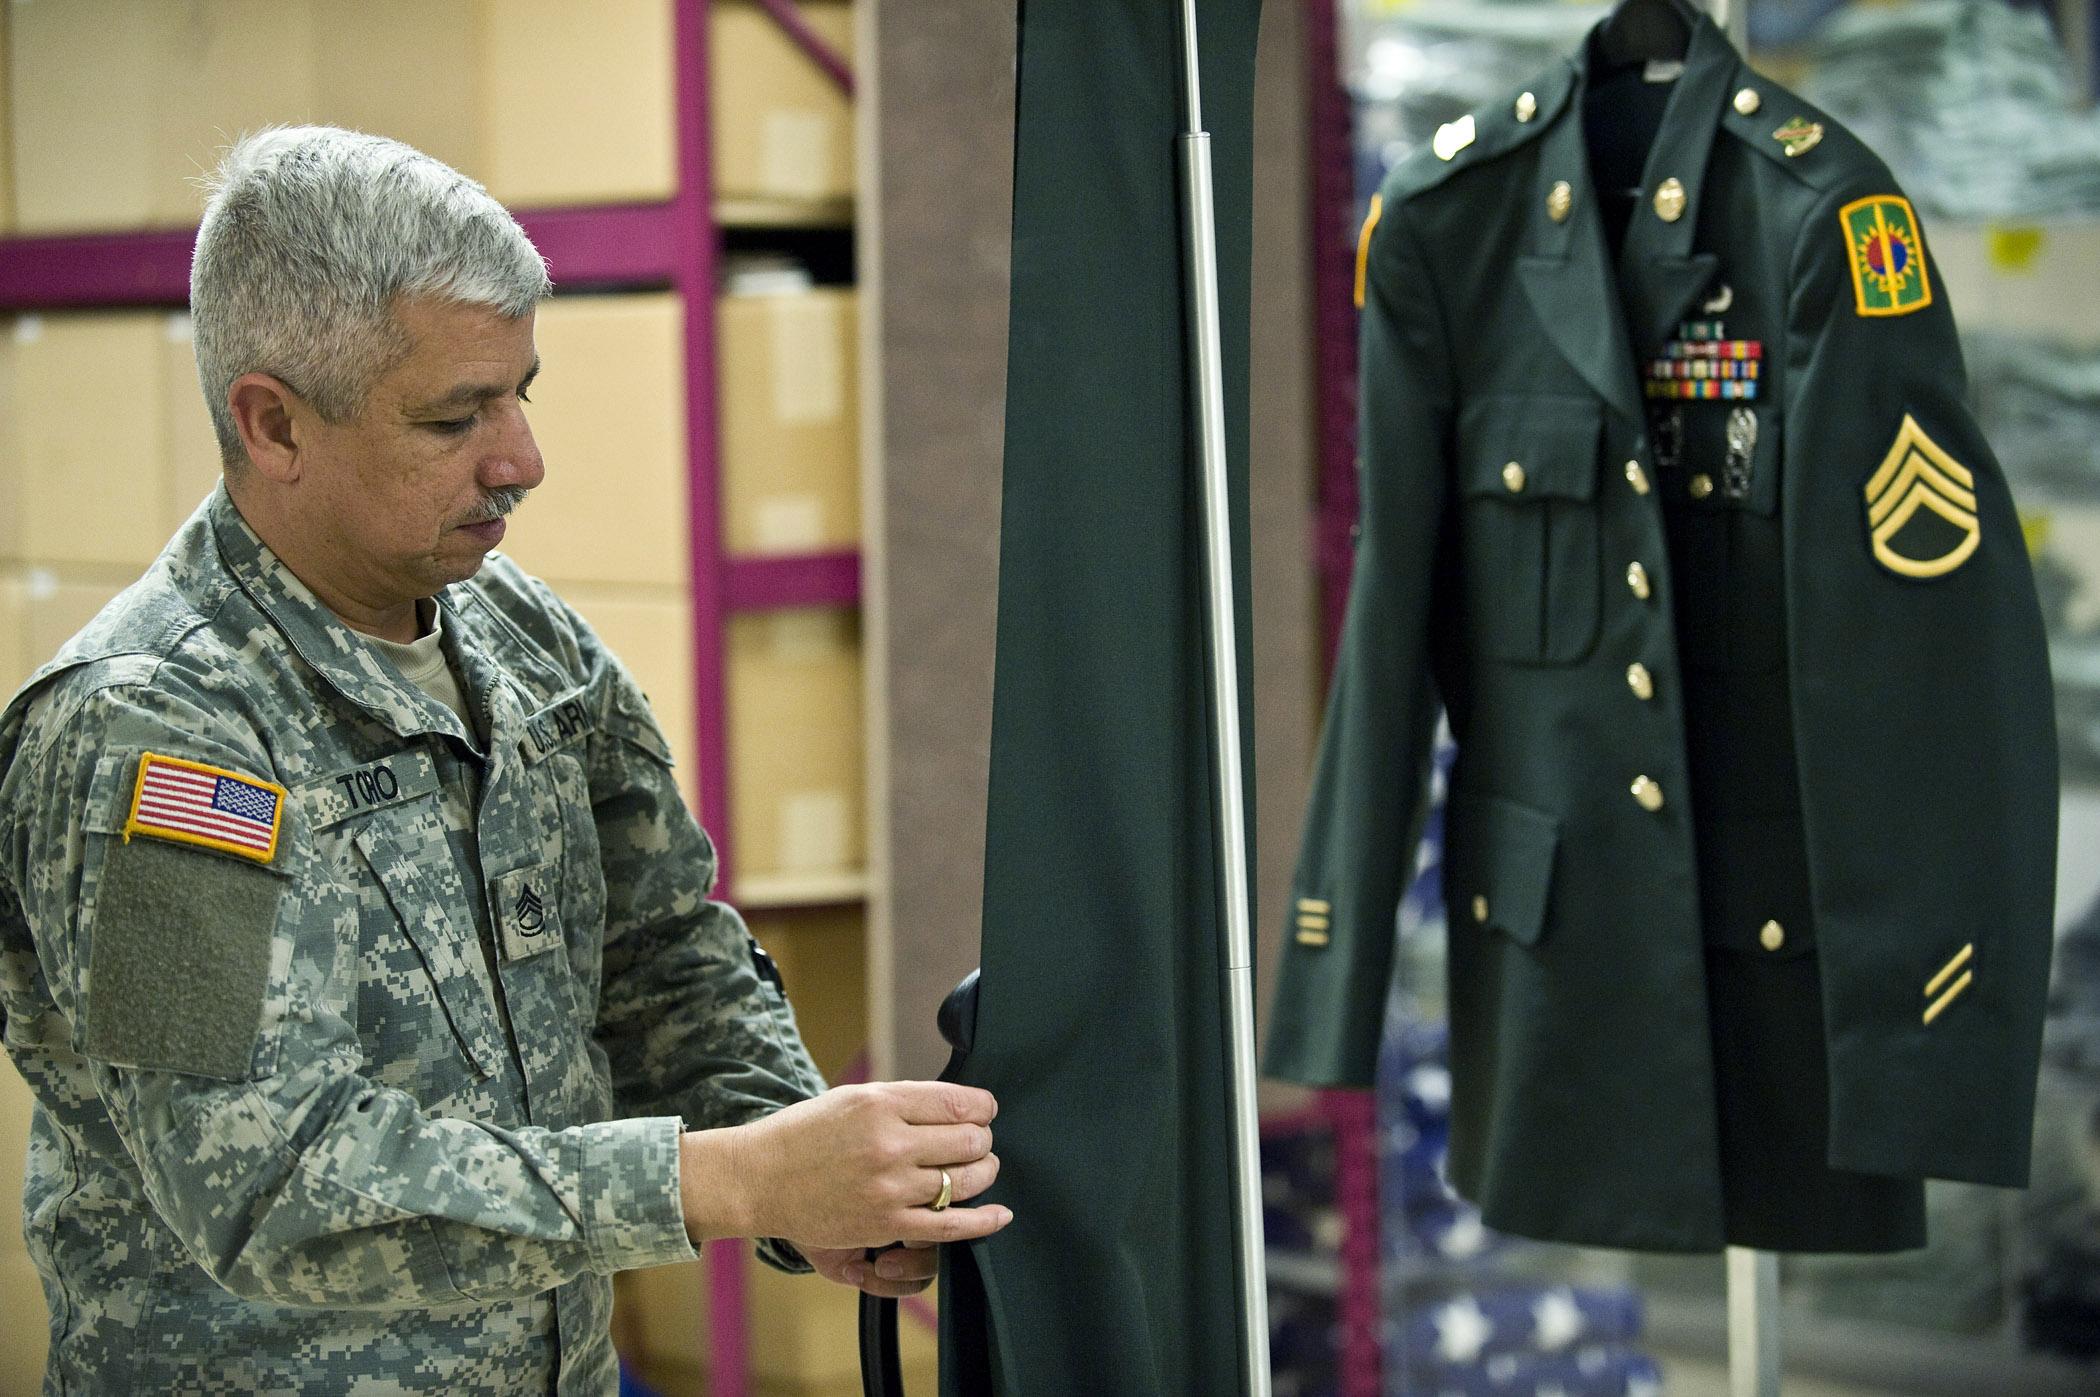 Quartermaster Uniforms Long Beach